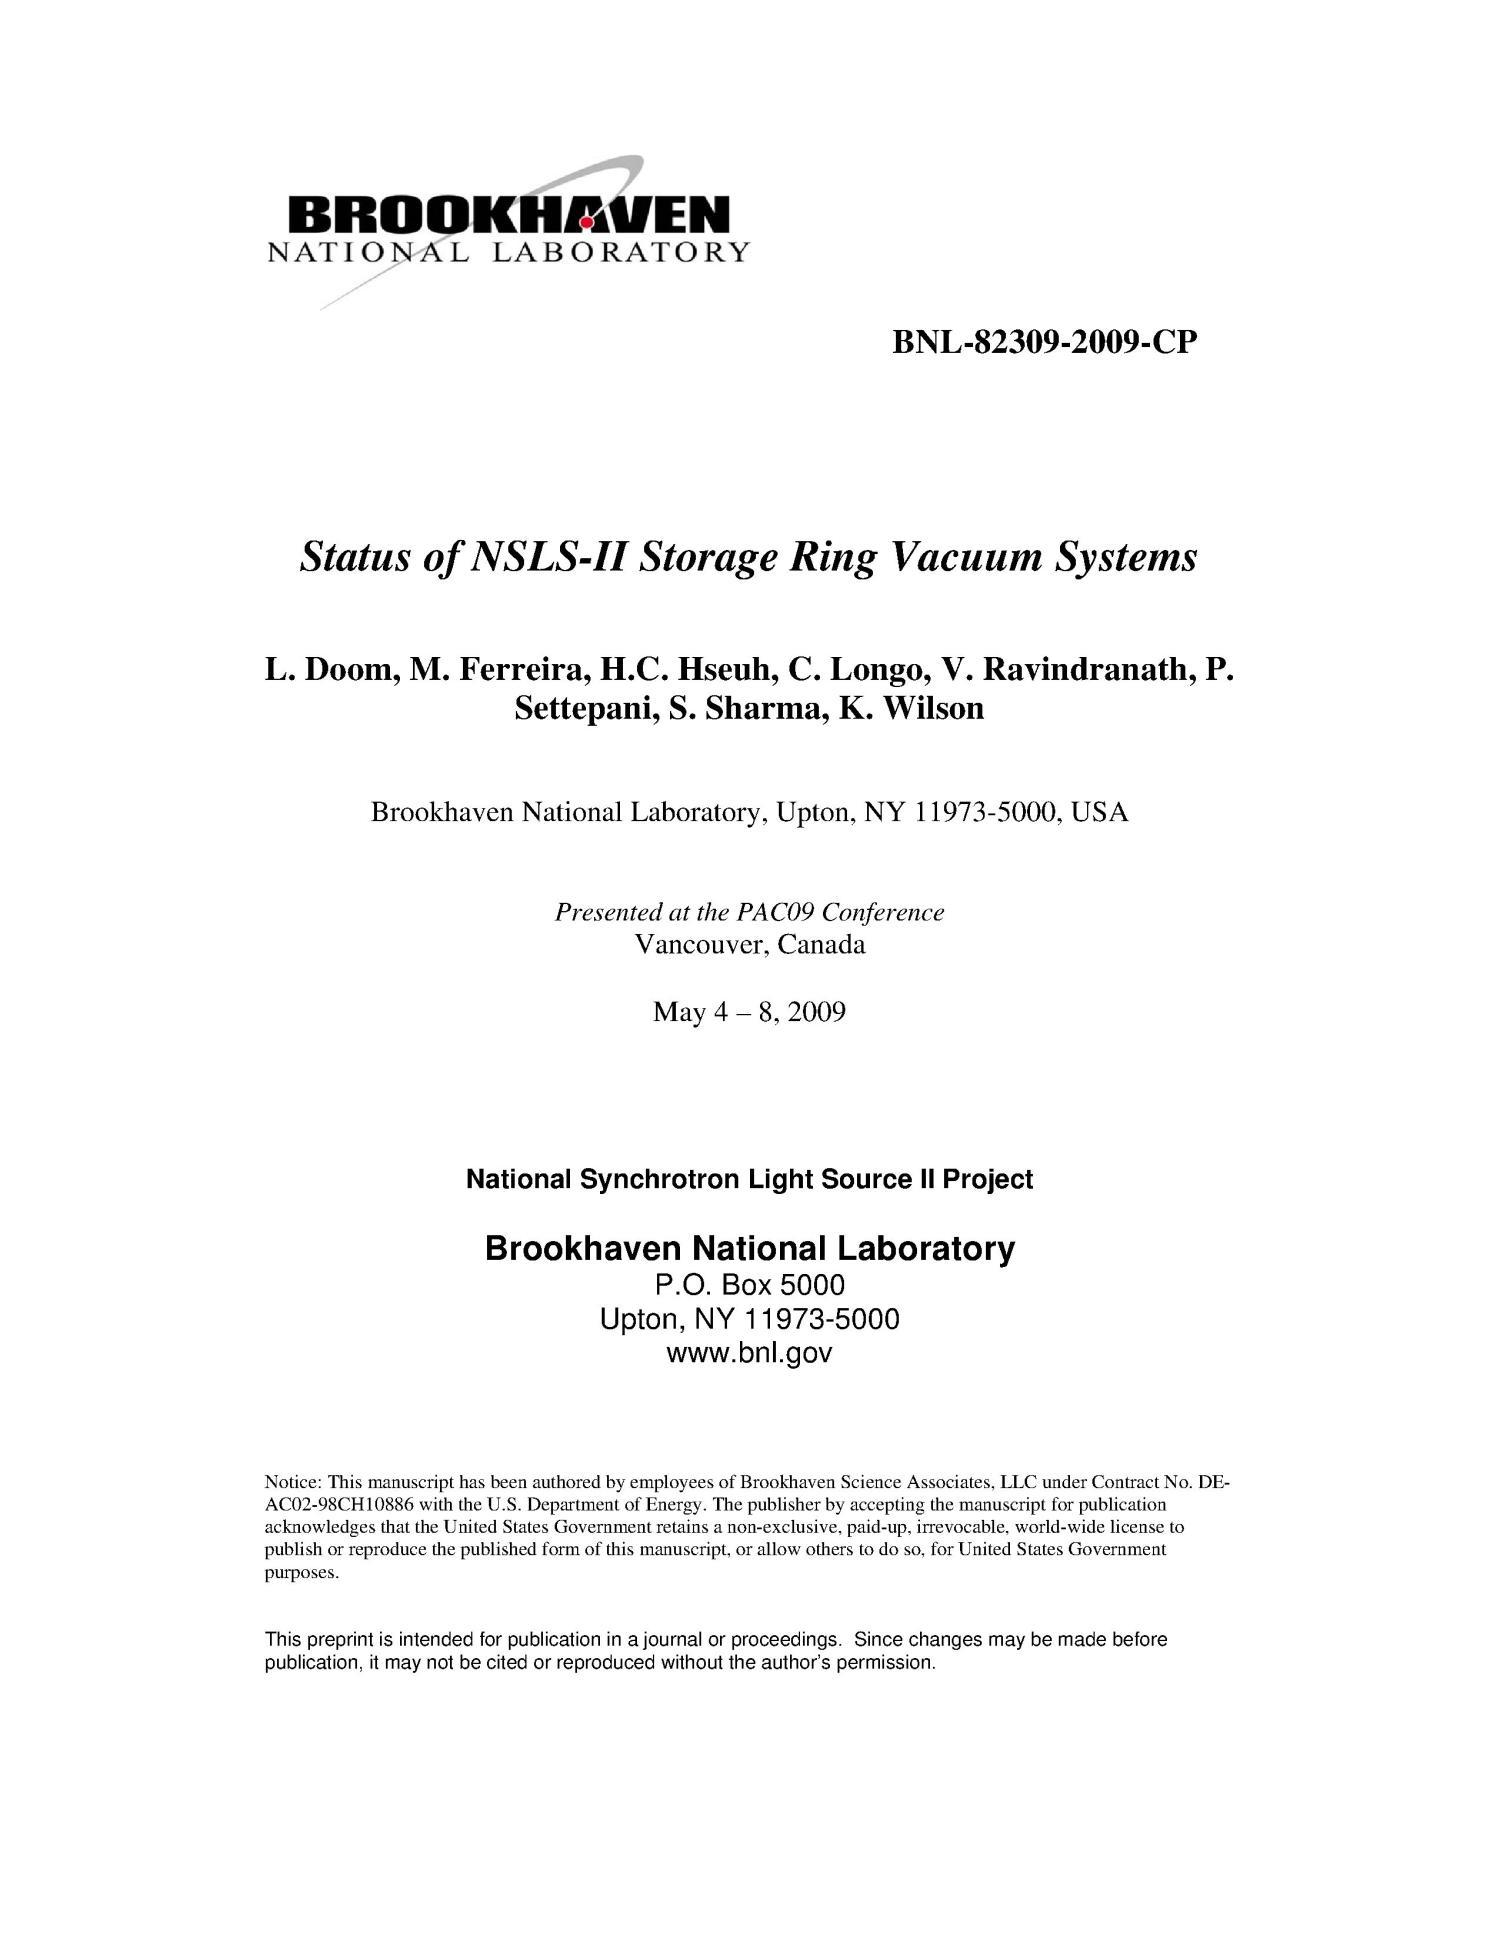 Status of NSLS-II Storage Ring Vacuum Systems - Digital Library